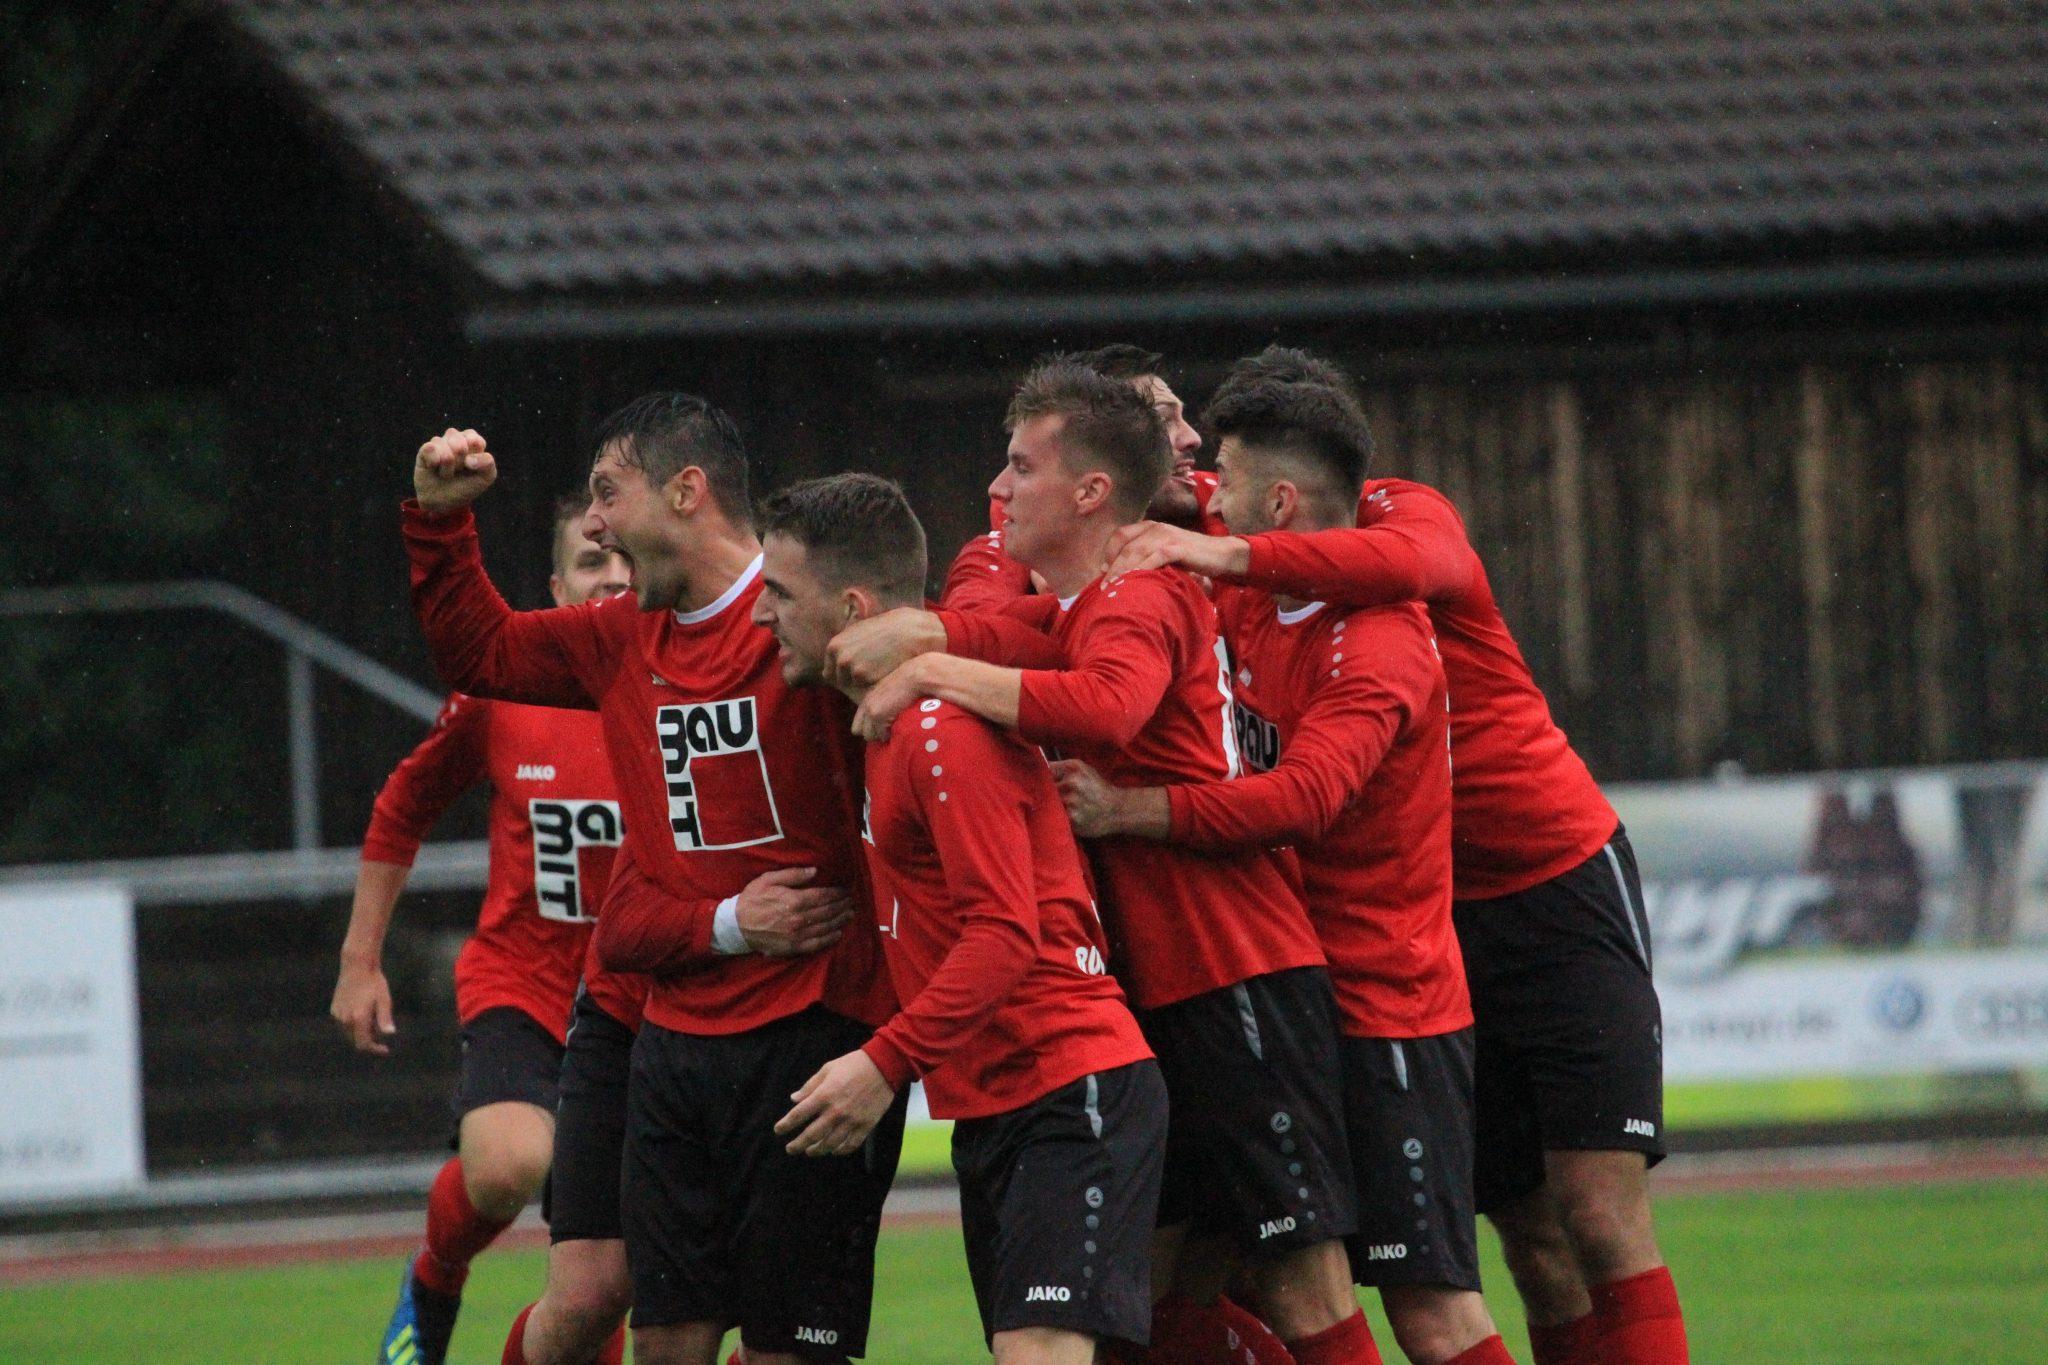 Saisonrückblick Junioren 2018/2019